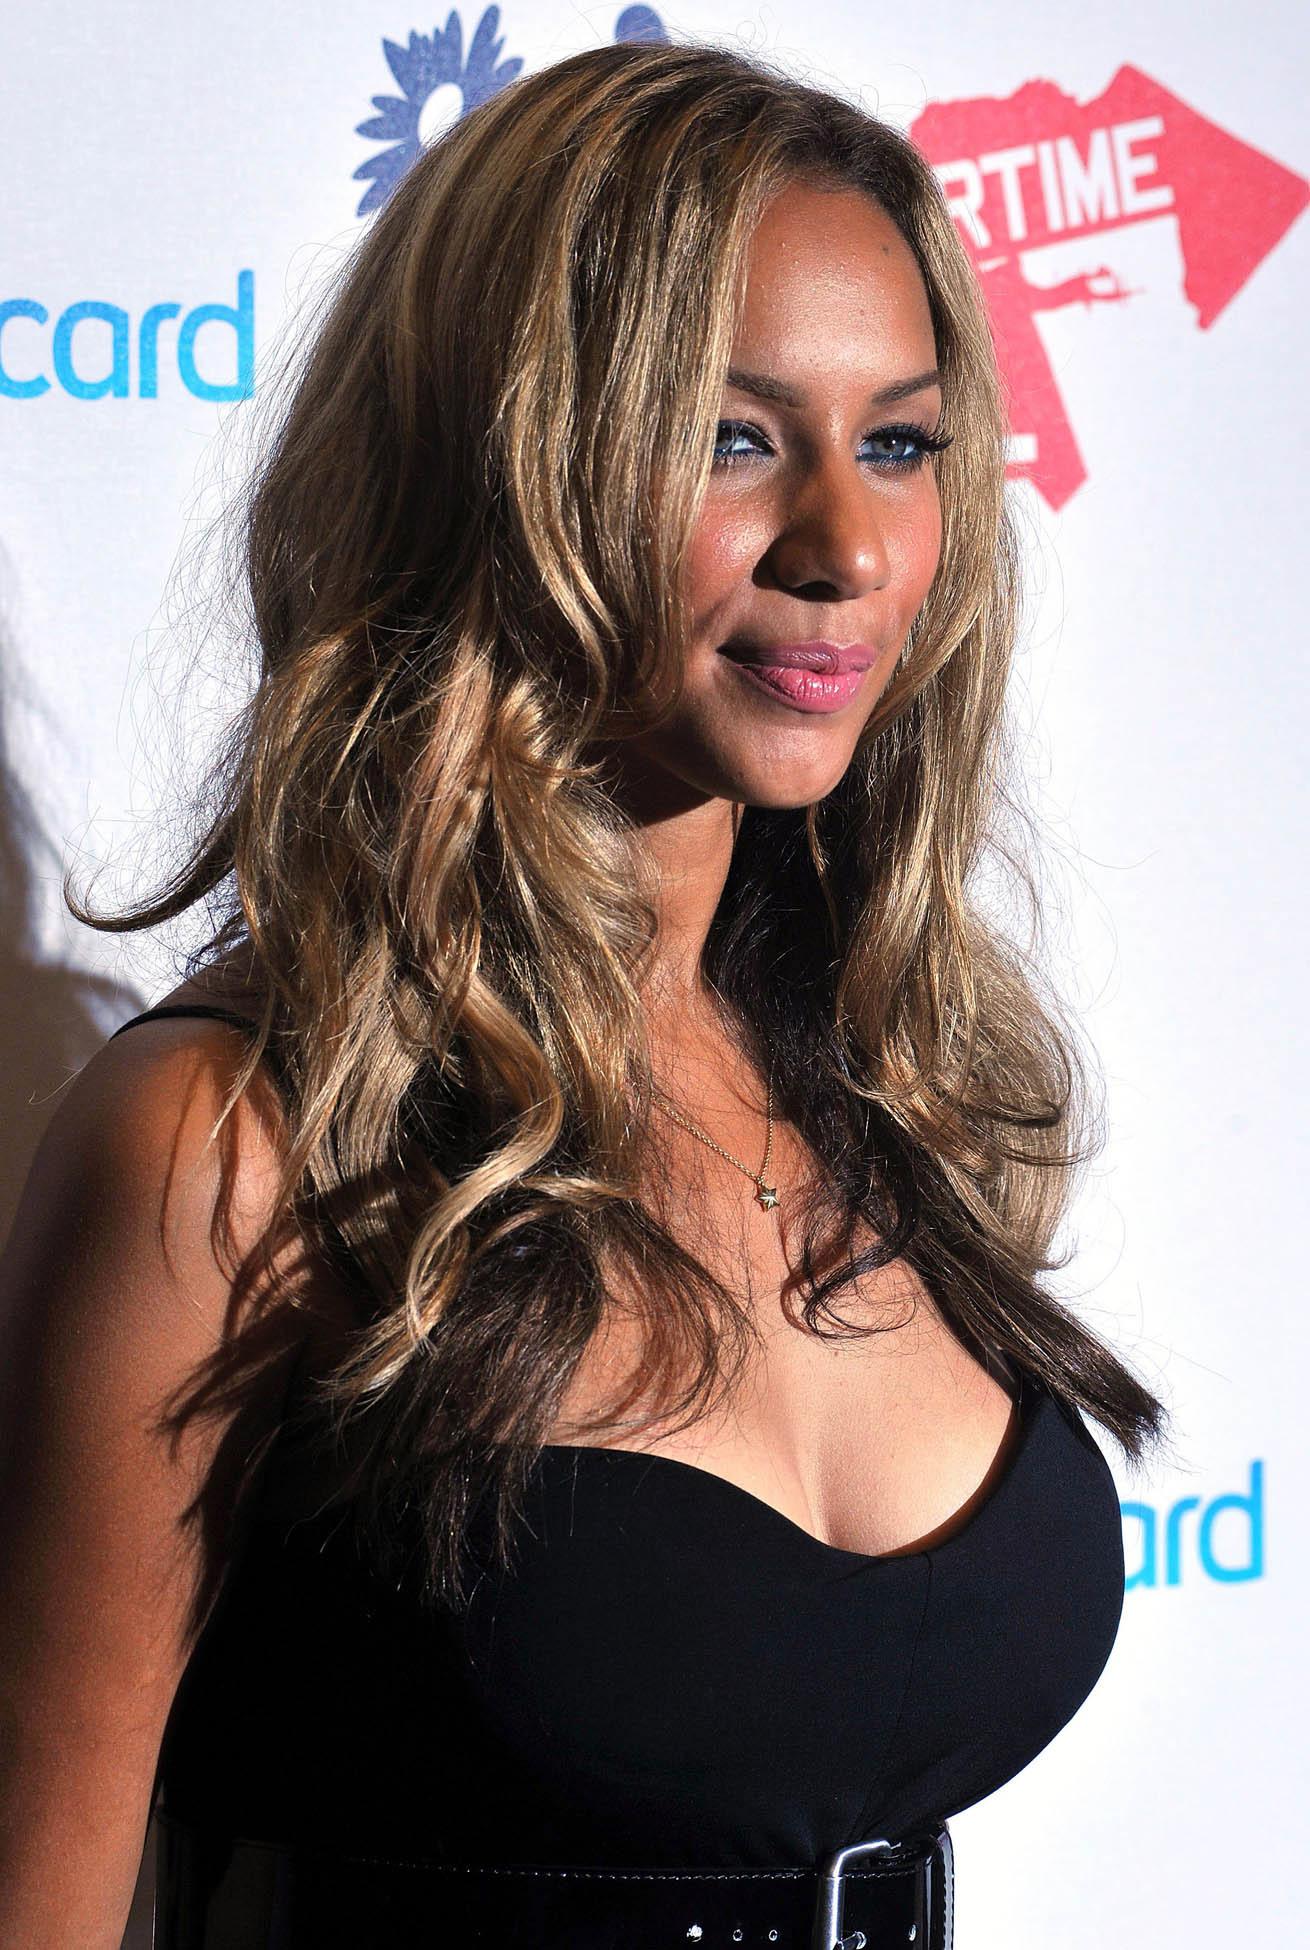 Leona Lewis Tits 16